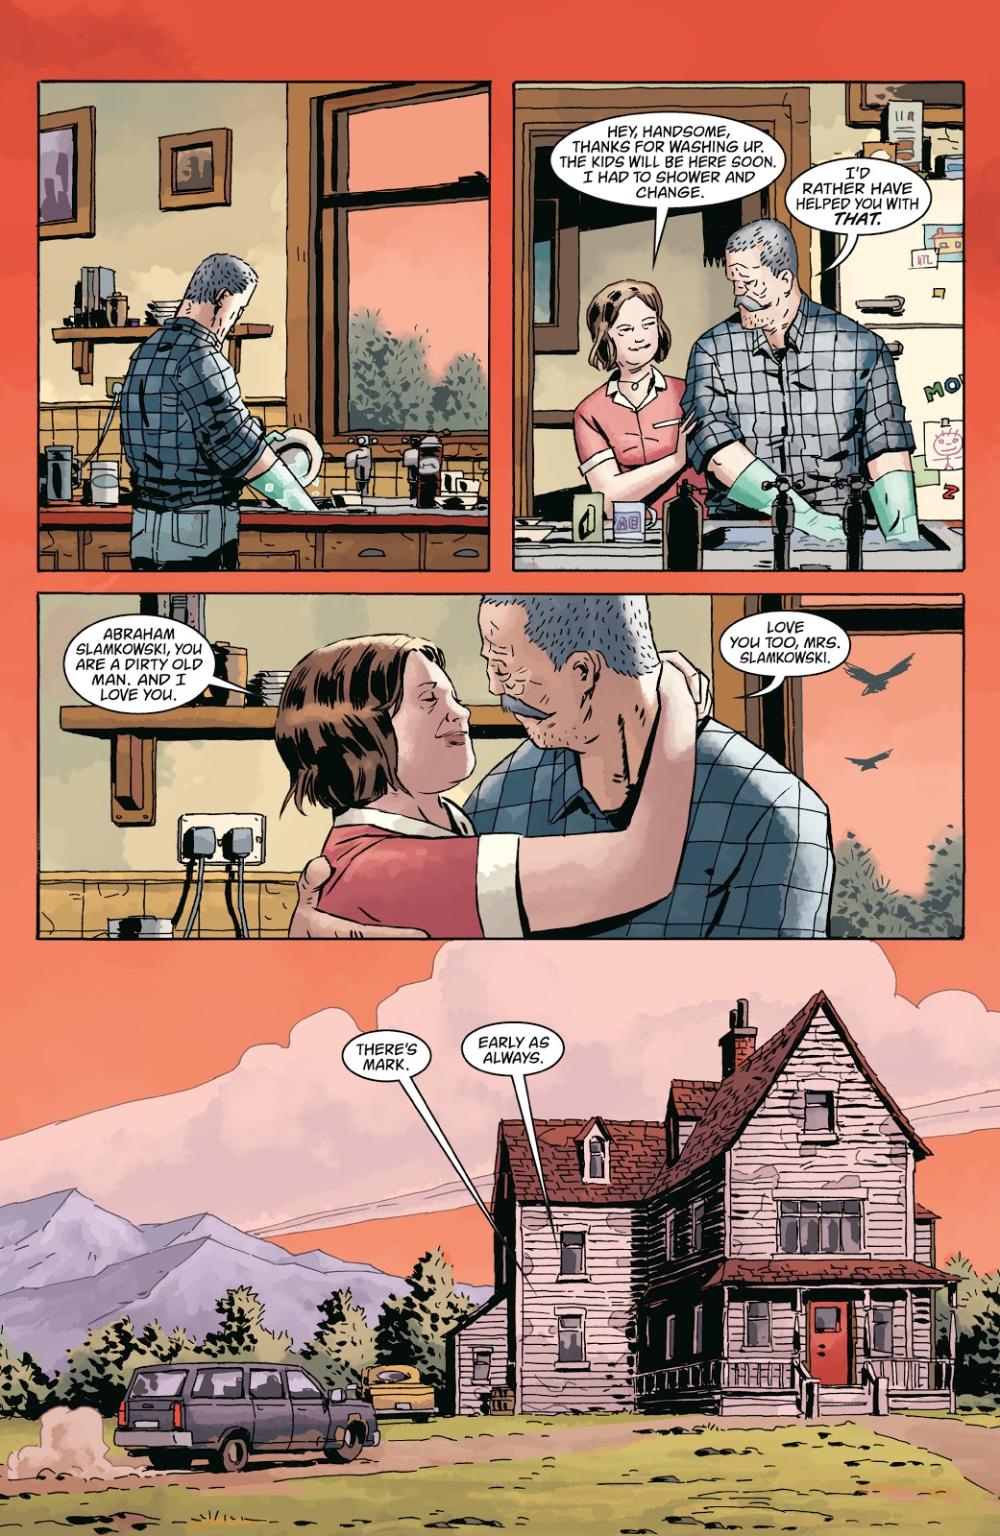 Black Hammer Age Of Doom Issue 12 Read Black Hammer Age Of Doom Issue 12 Comic Online In High Quality Comics Comic Art Comics Online